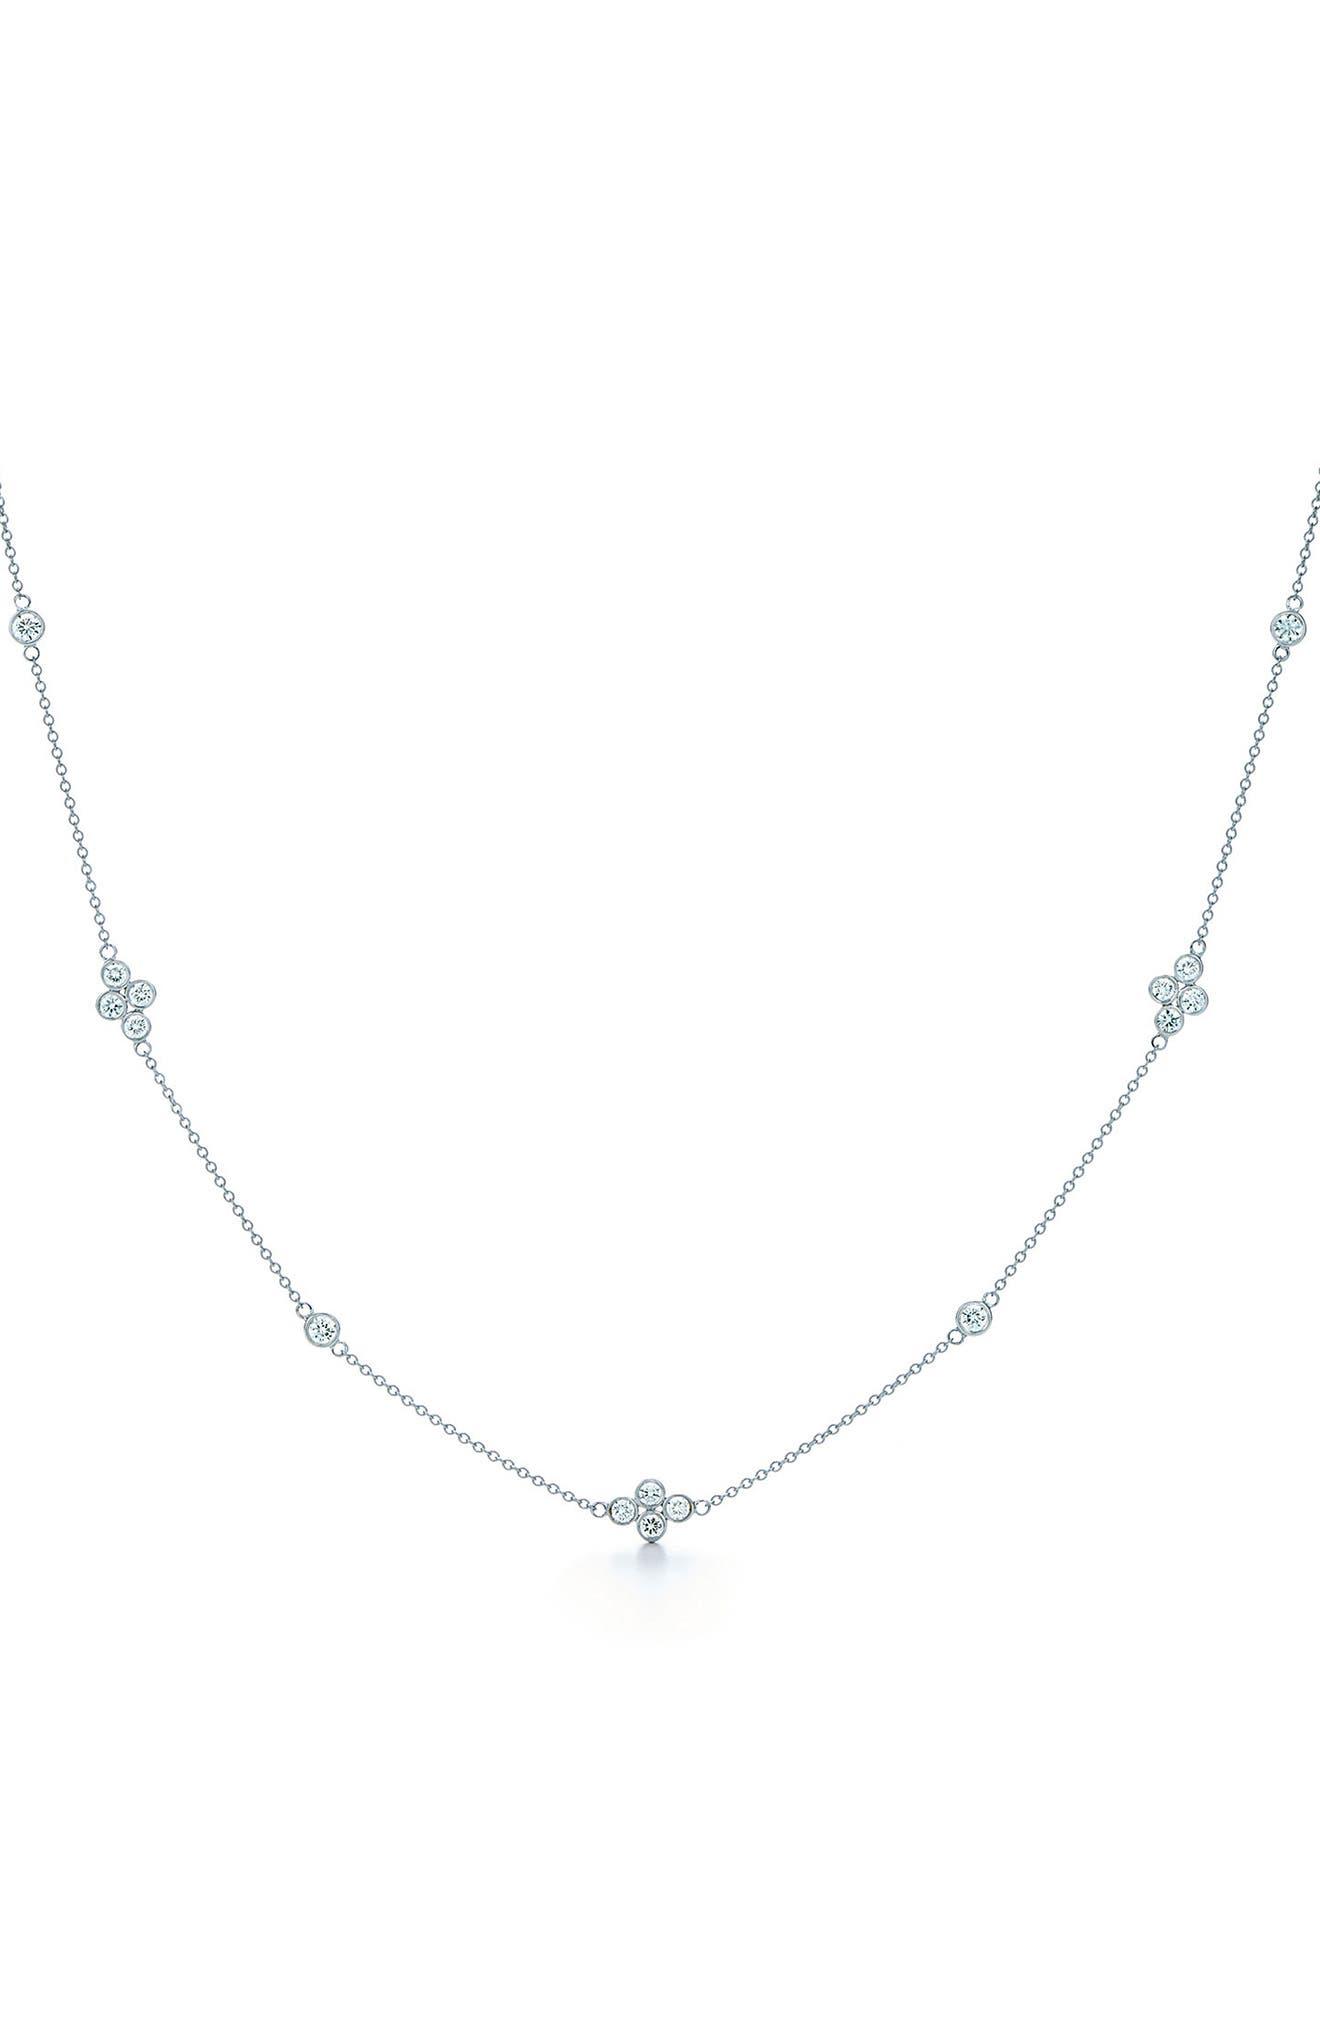 Diamond Collar Necklace,                         Main,                         color, White Gold